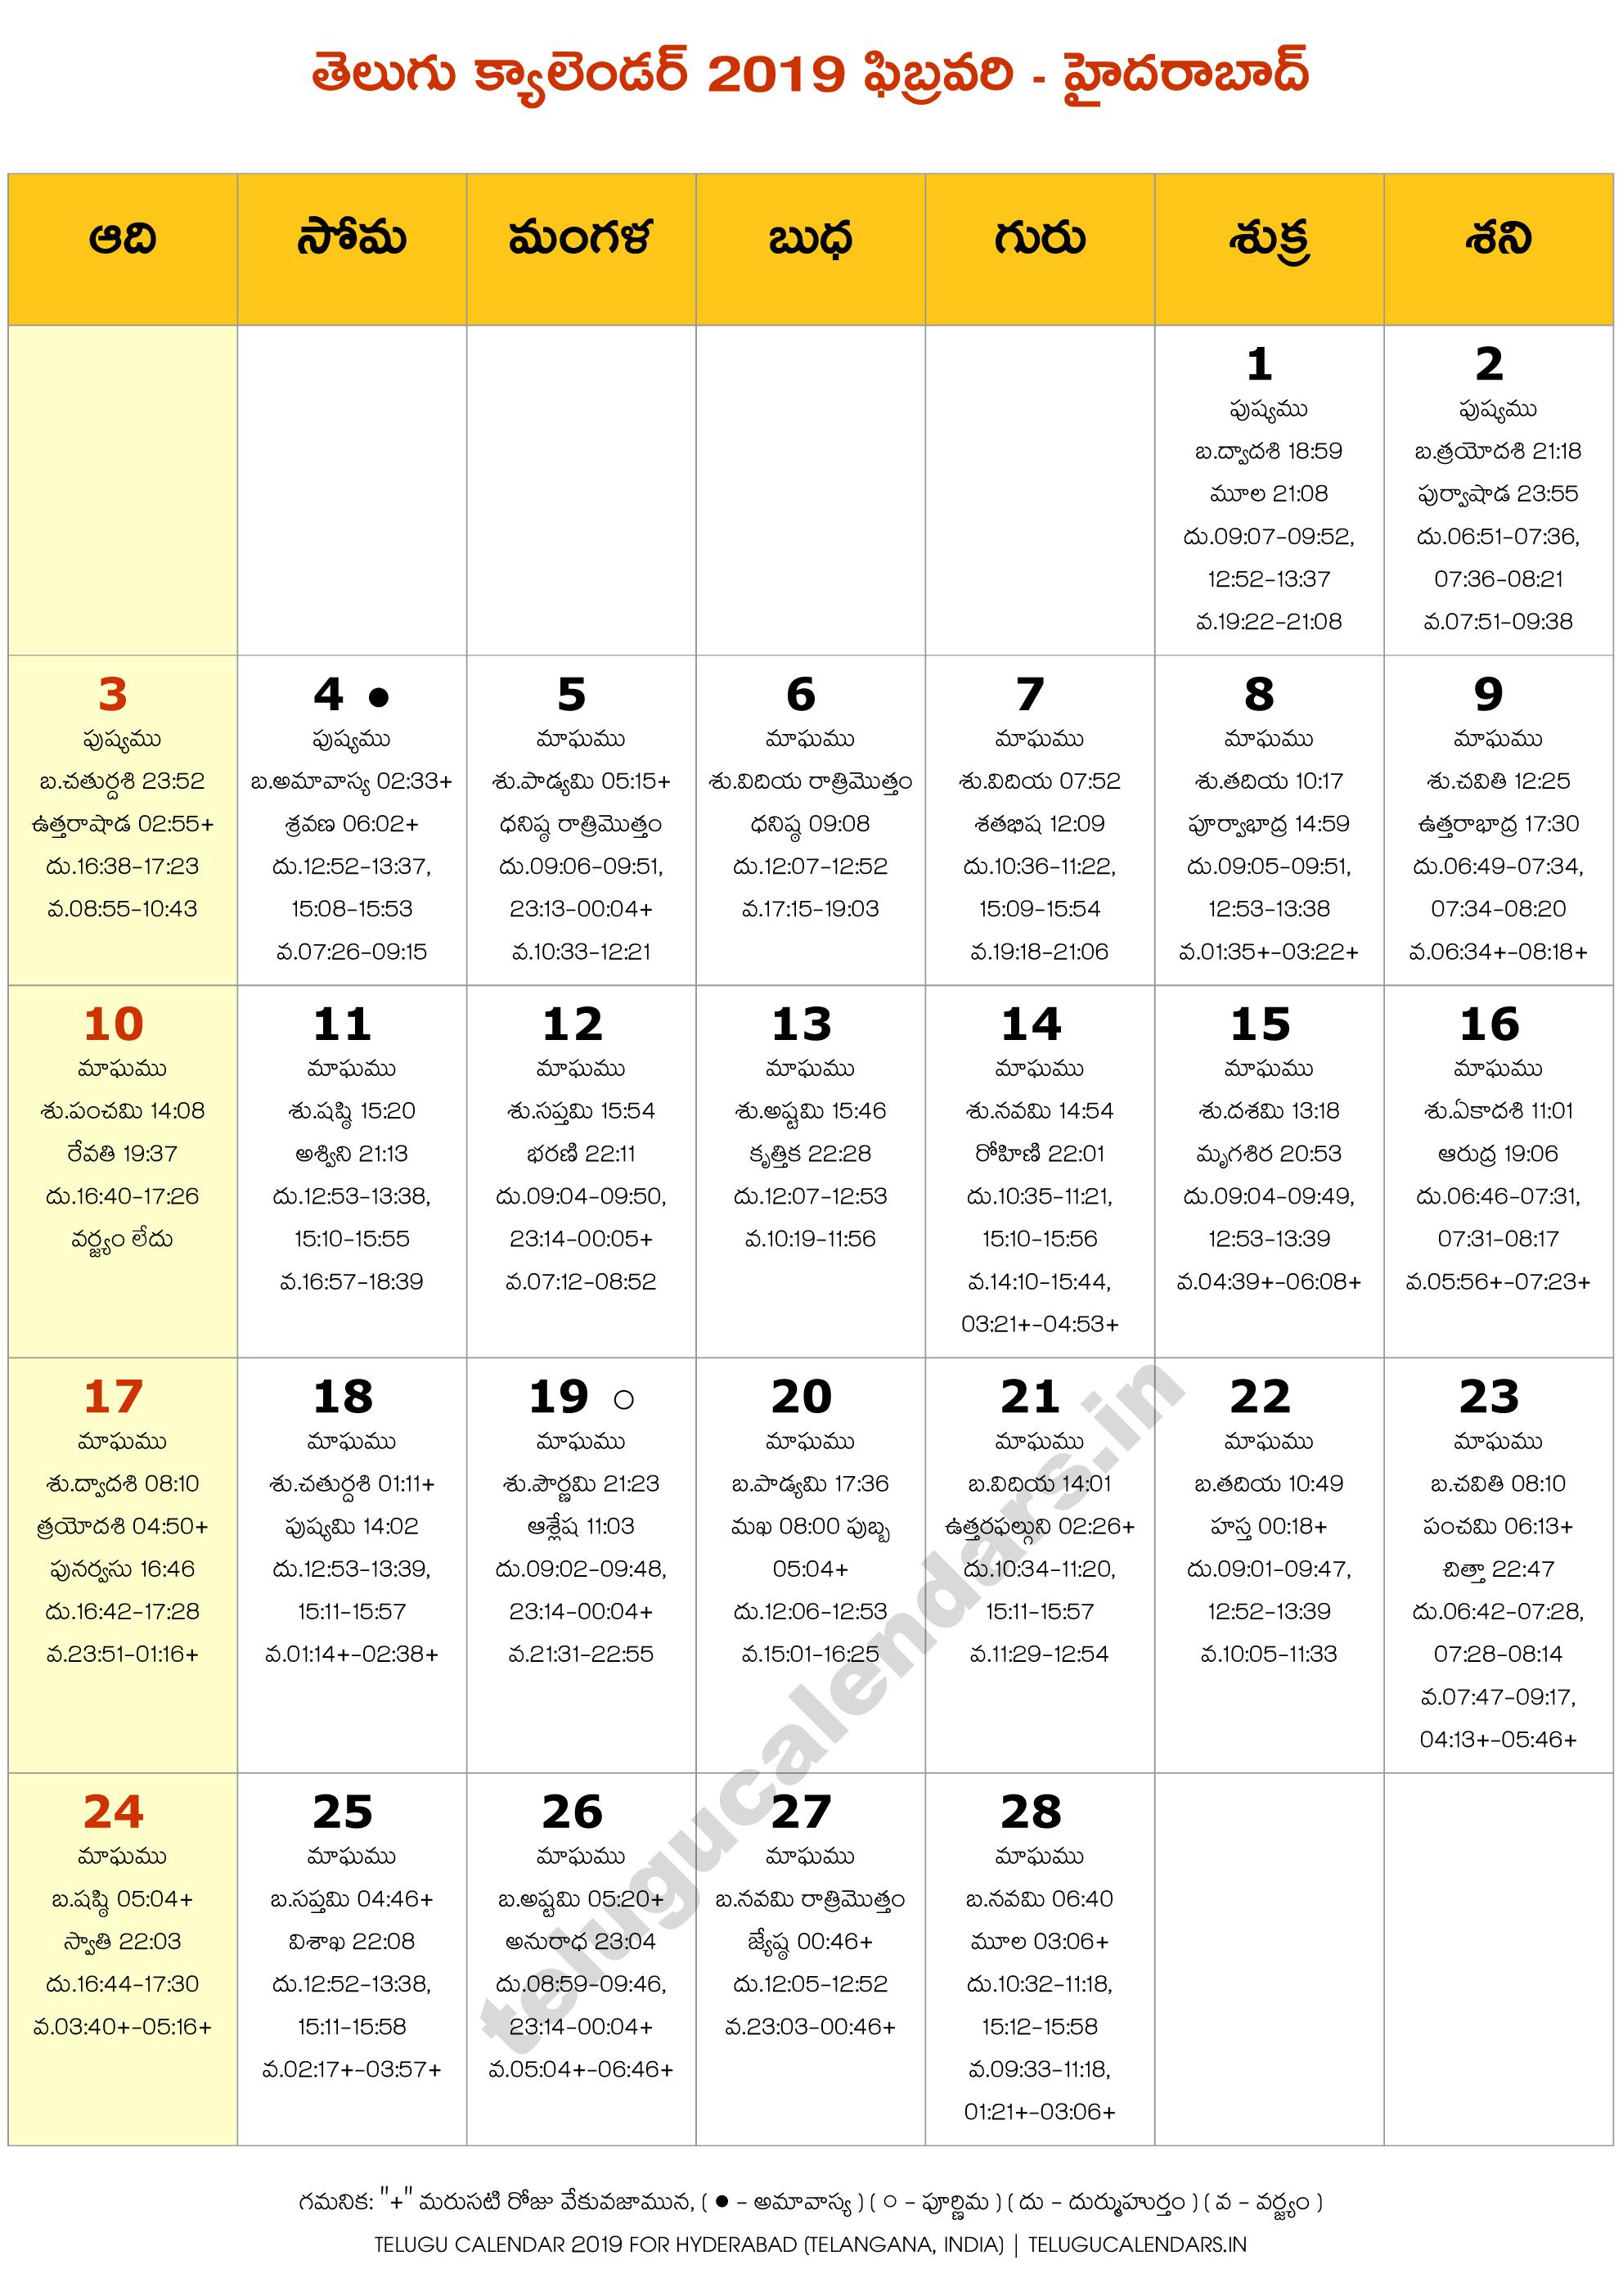 Hyderabad Telugu Calendar 2019 February